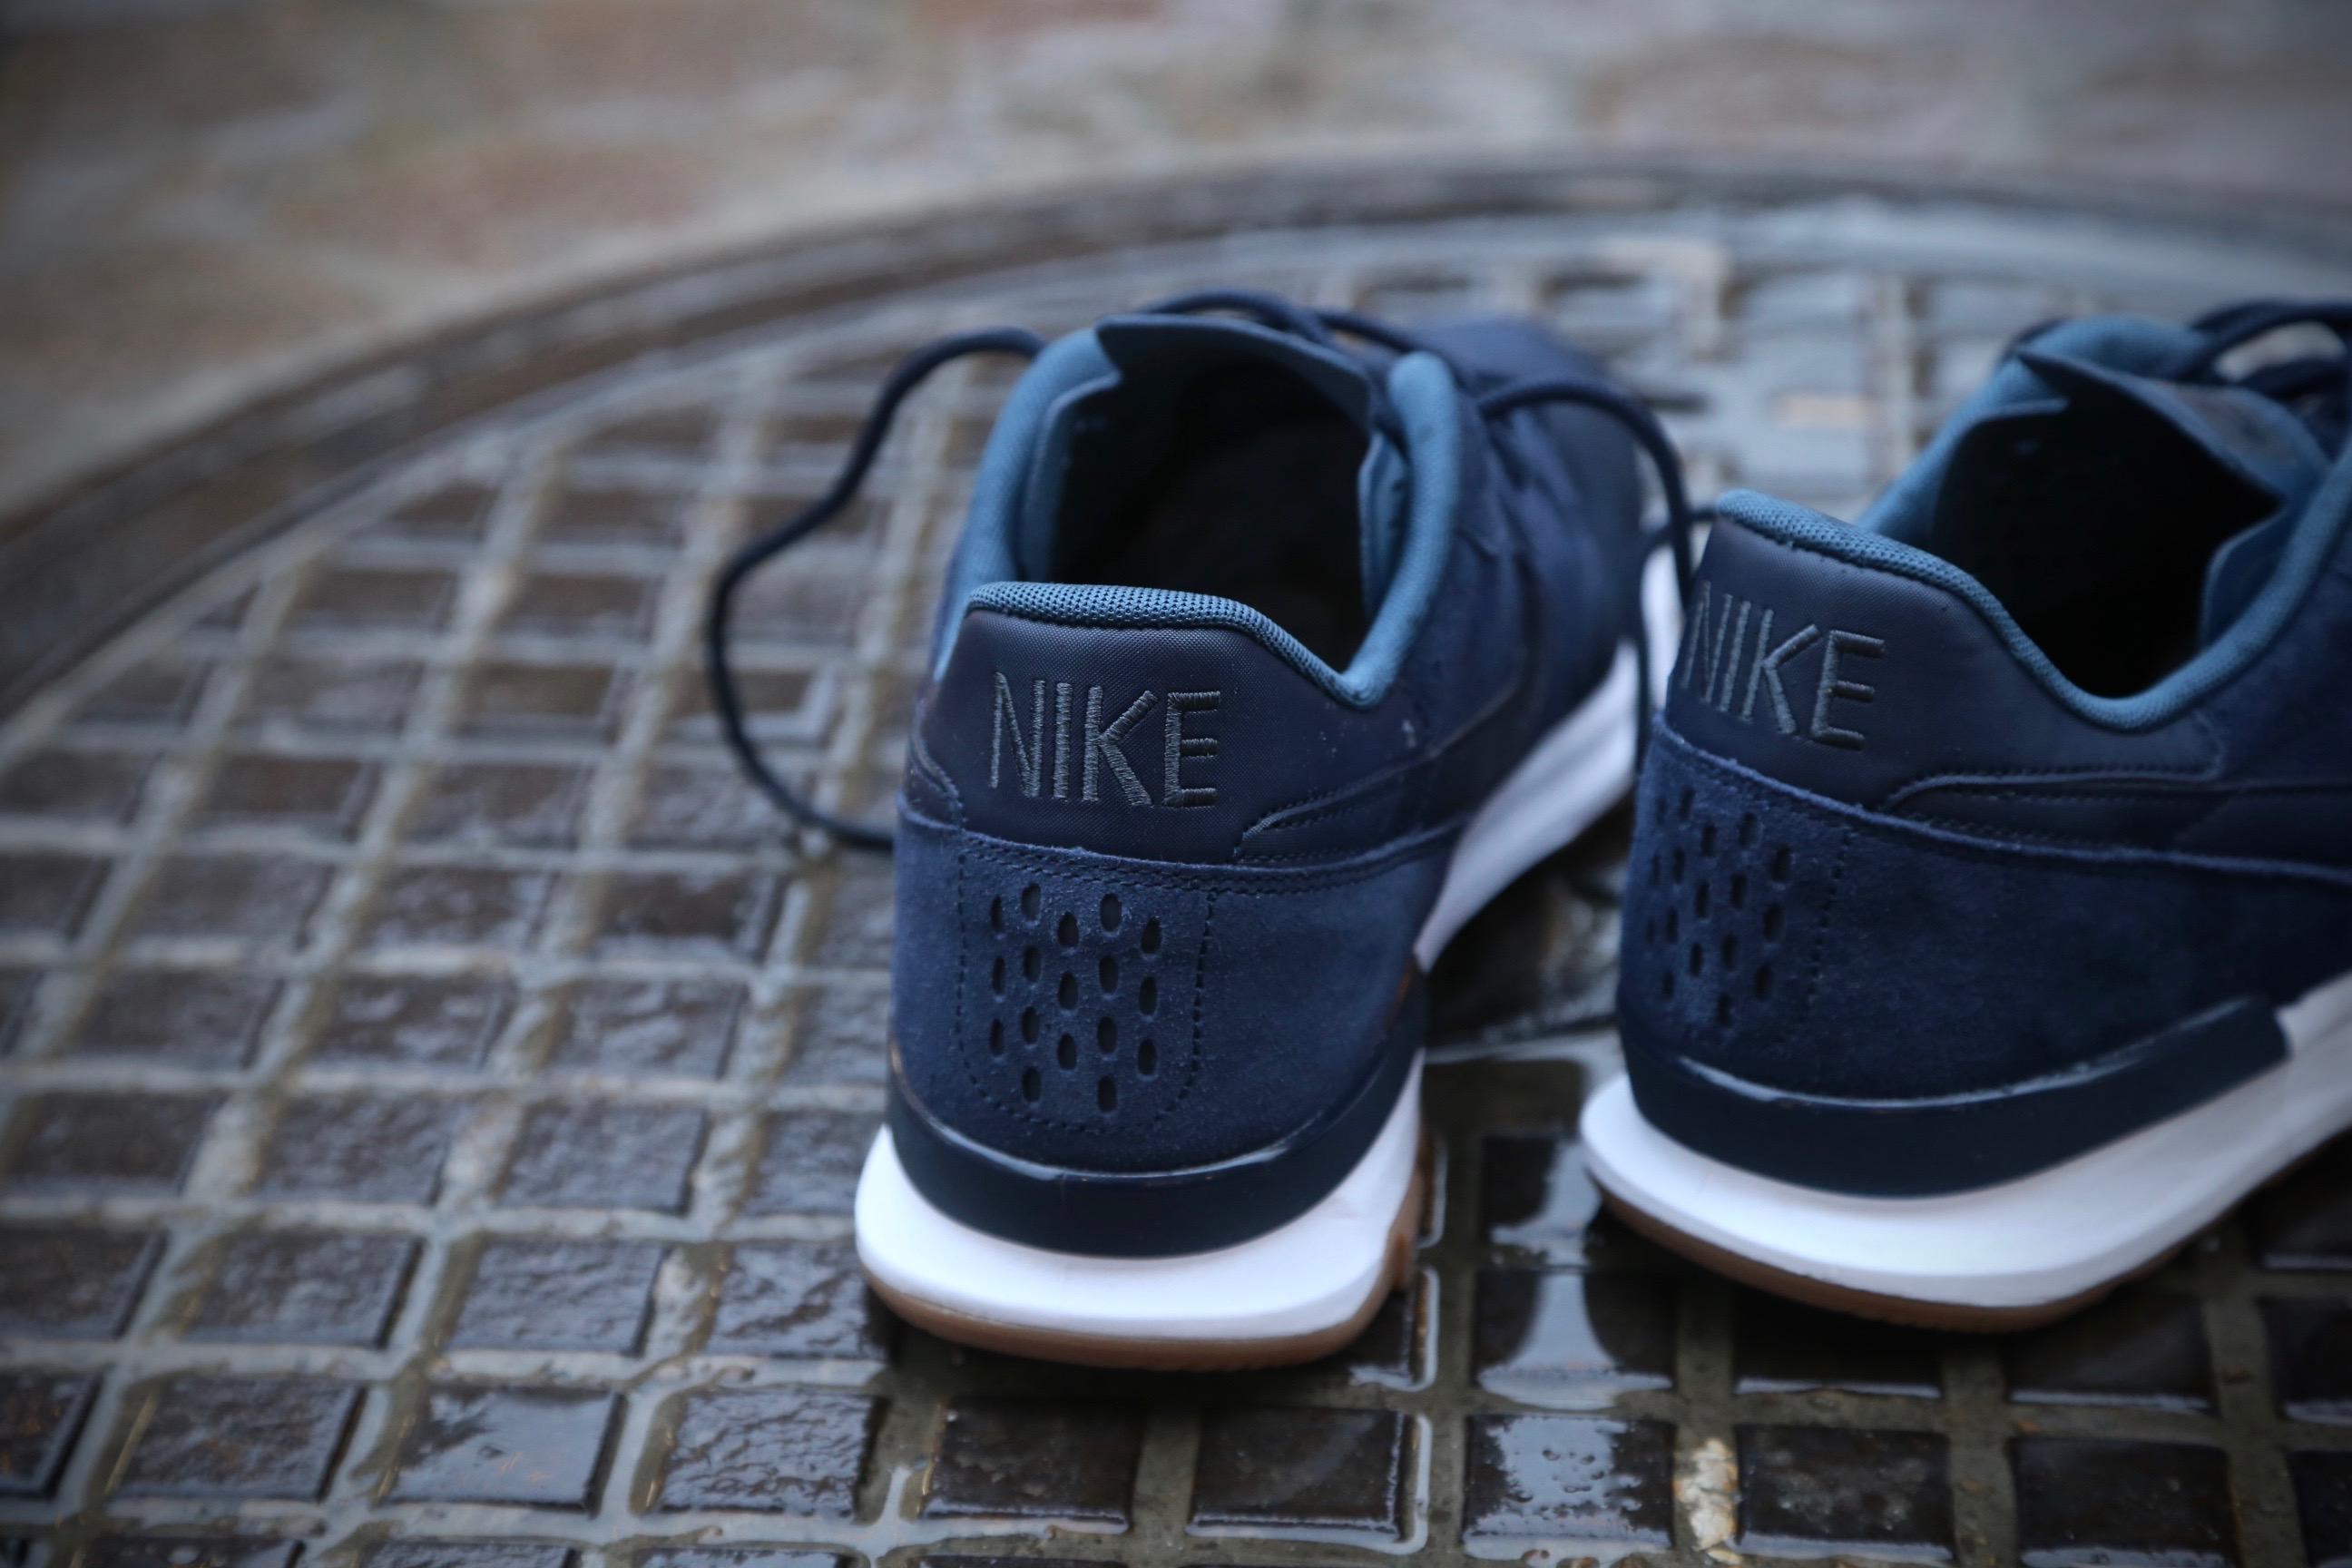 separation shoes cae7b 18dbc http   goat.lasix-order-online.com khrp 3 ...